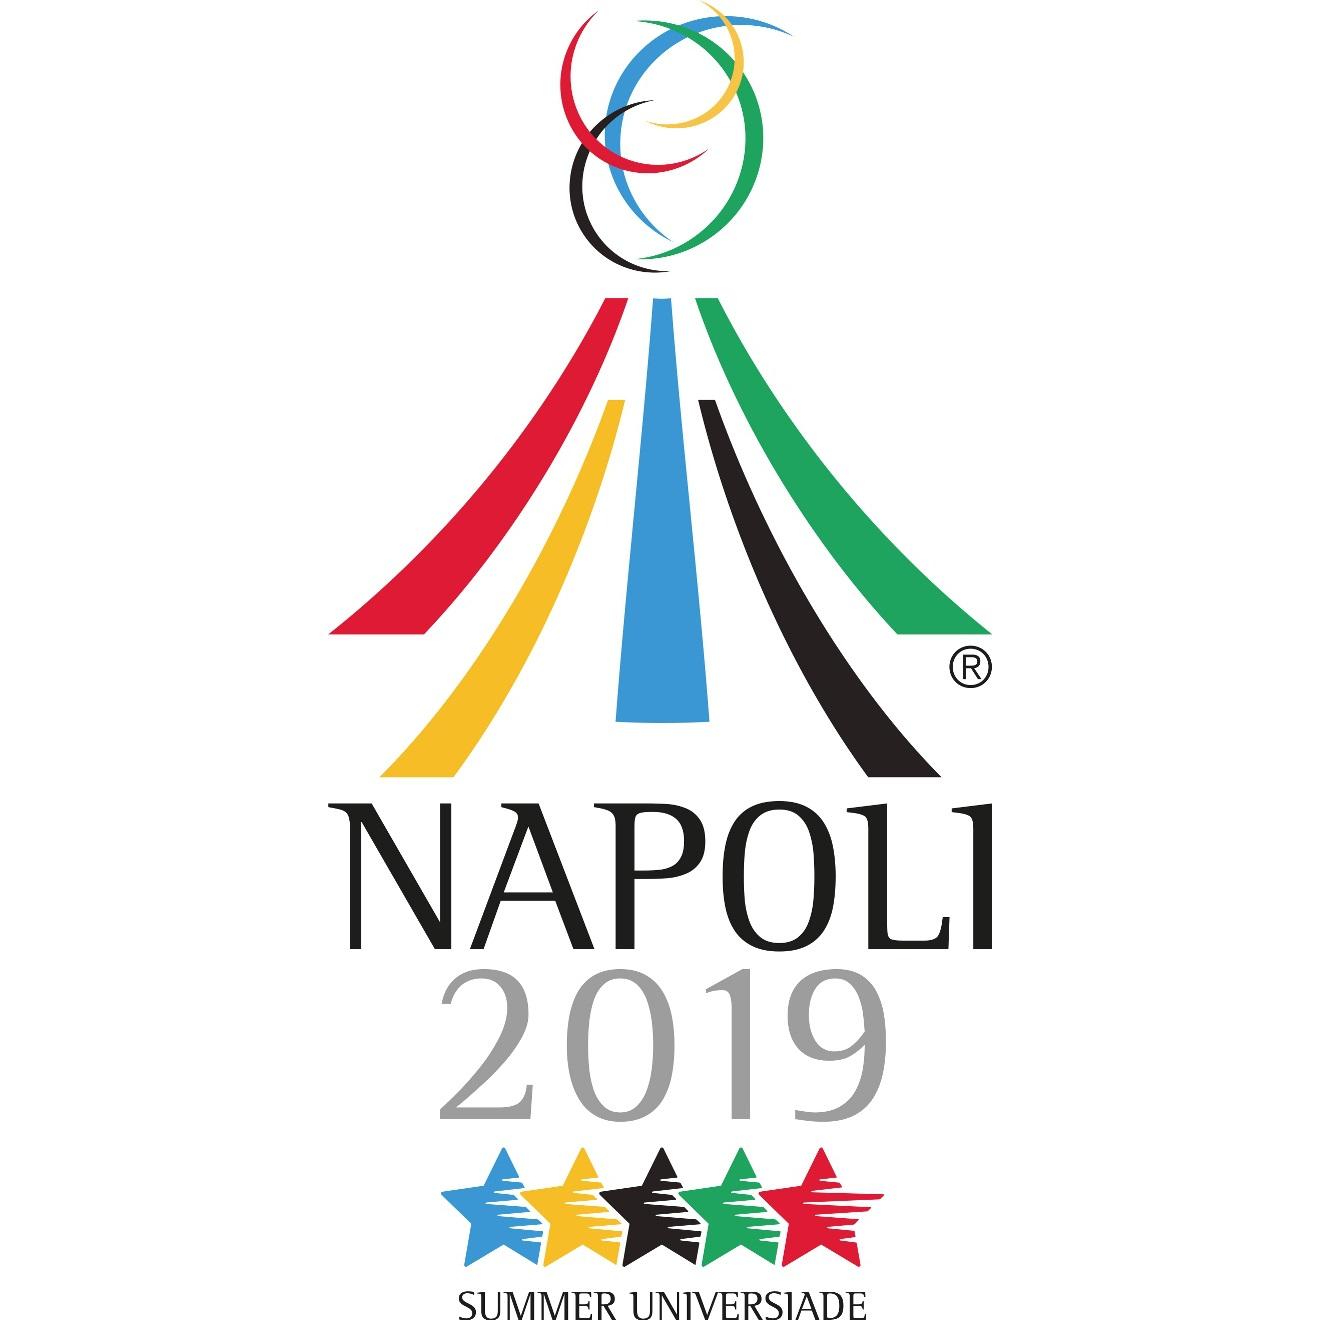 2019 Summer Universiade